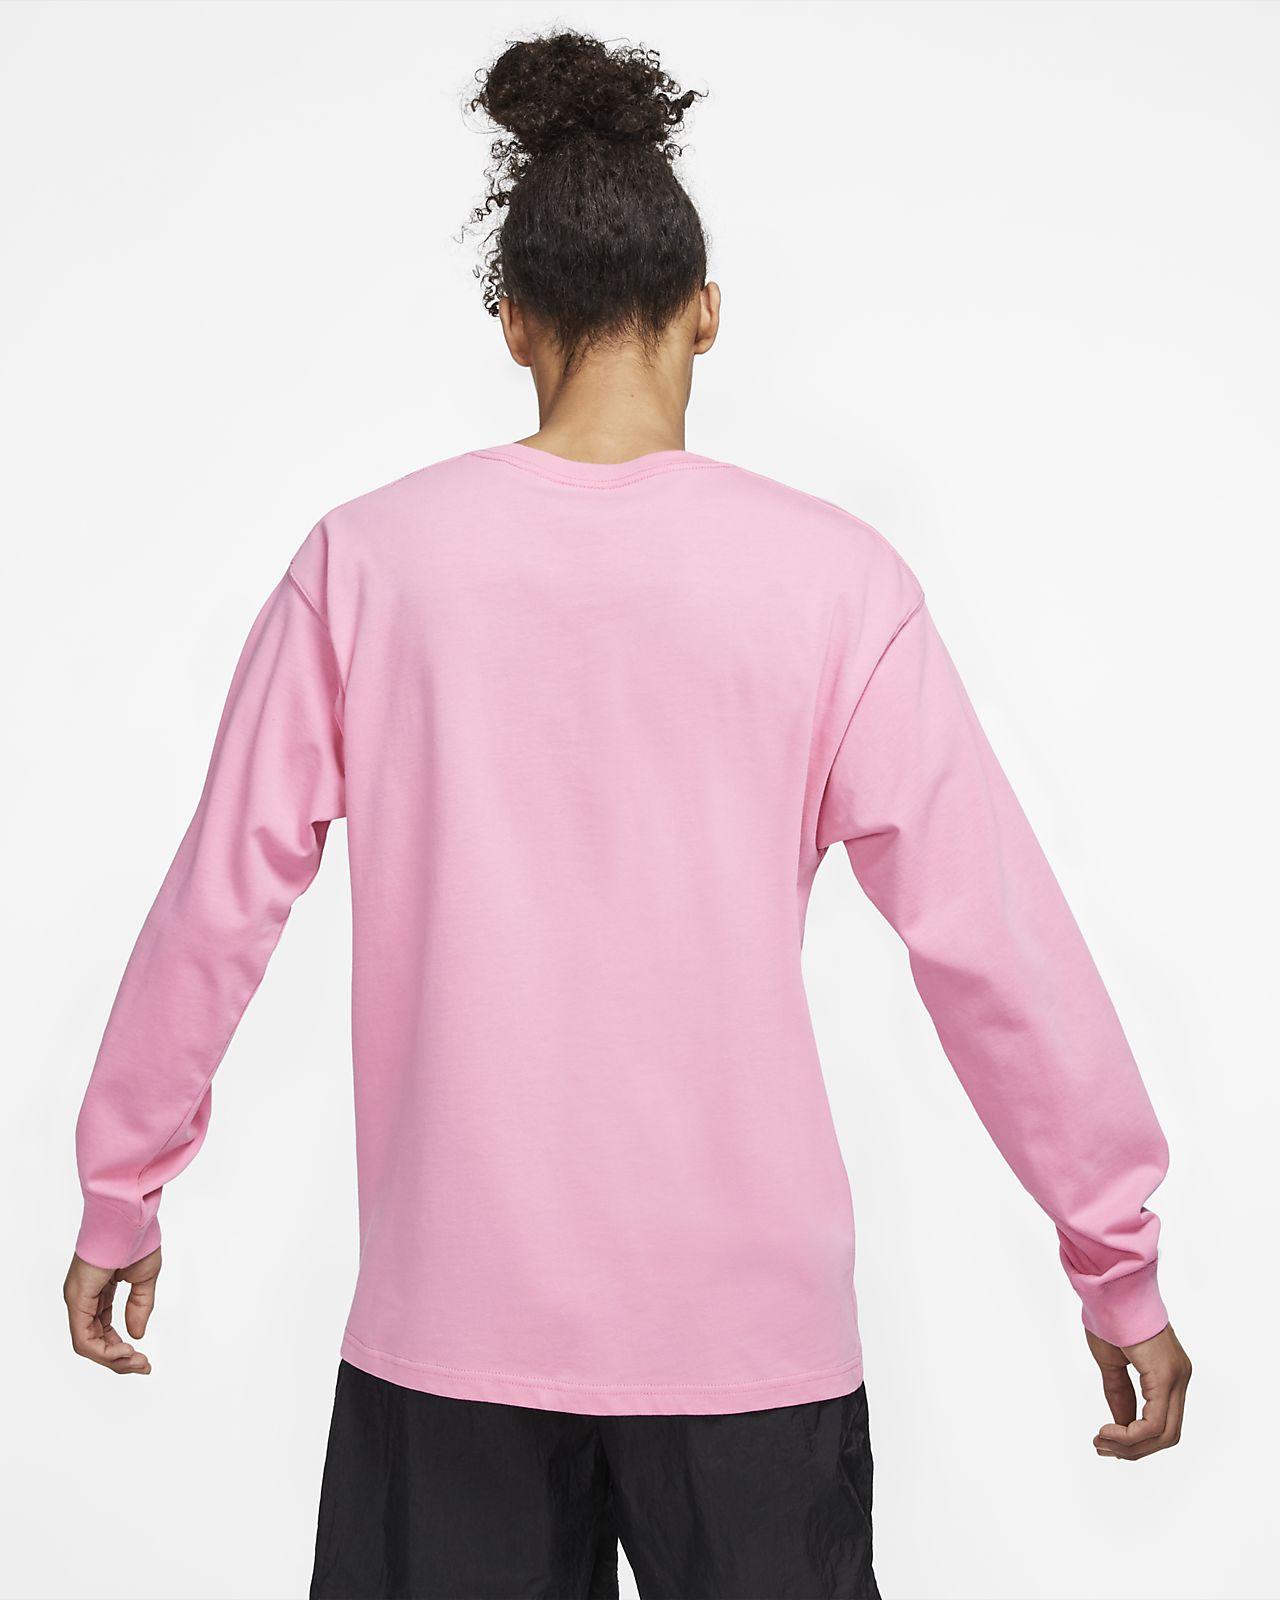 e2eb4e82 Nike ACG Long-Sleeve T-Shirt. Nike.com LU